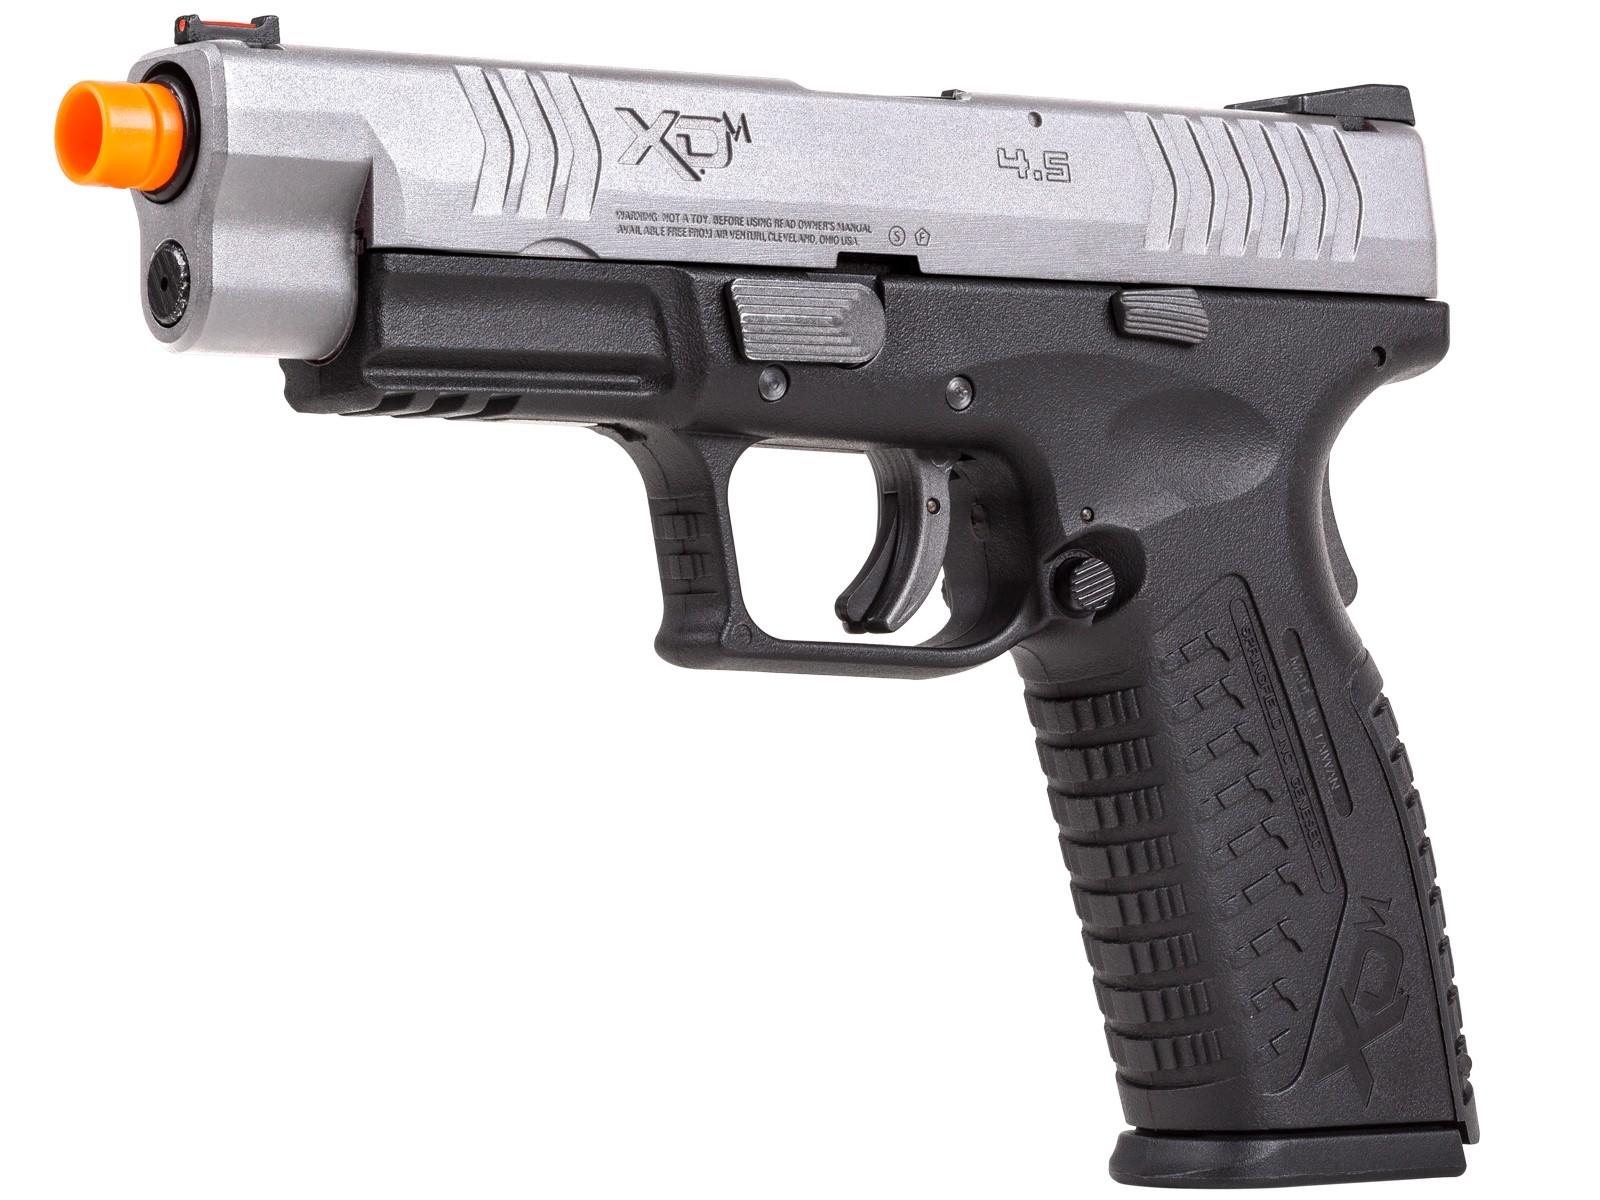 Springfield_Armory_XDM_45_GBB_Airsoft_Pistol_BiTone_6mm